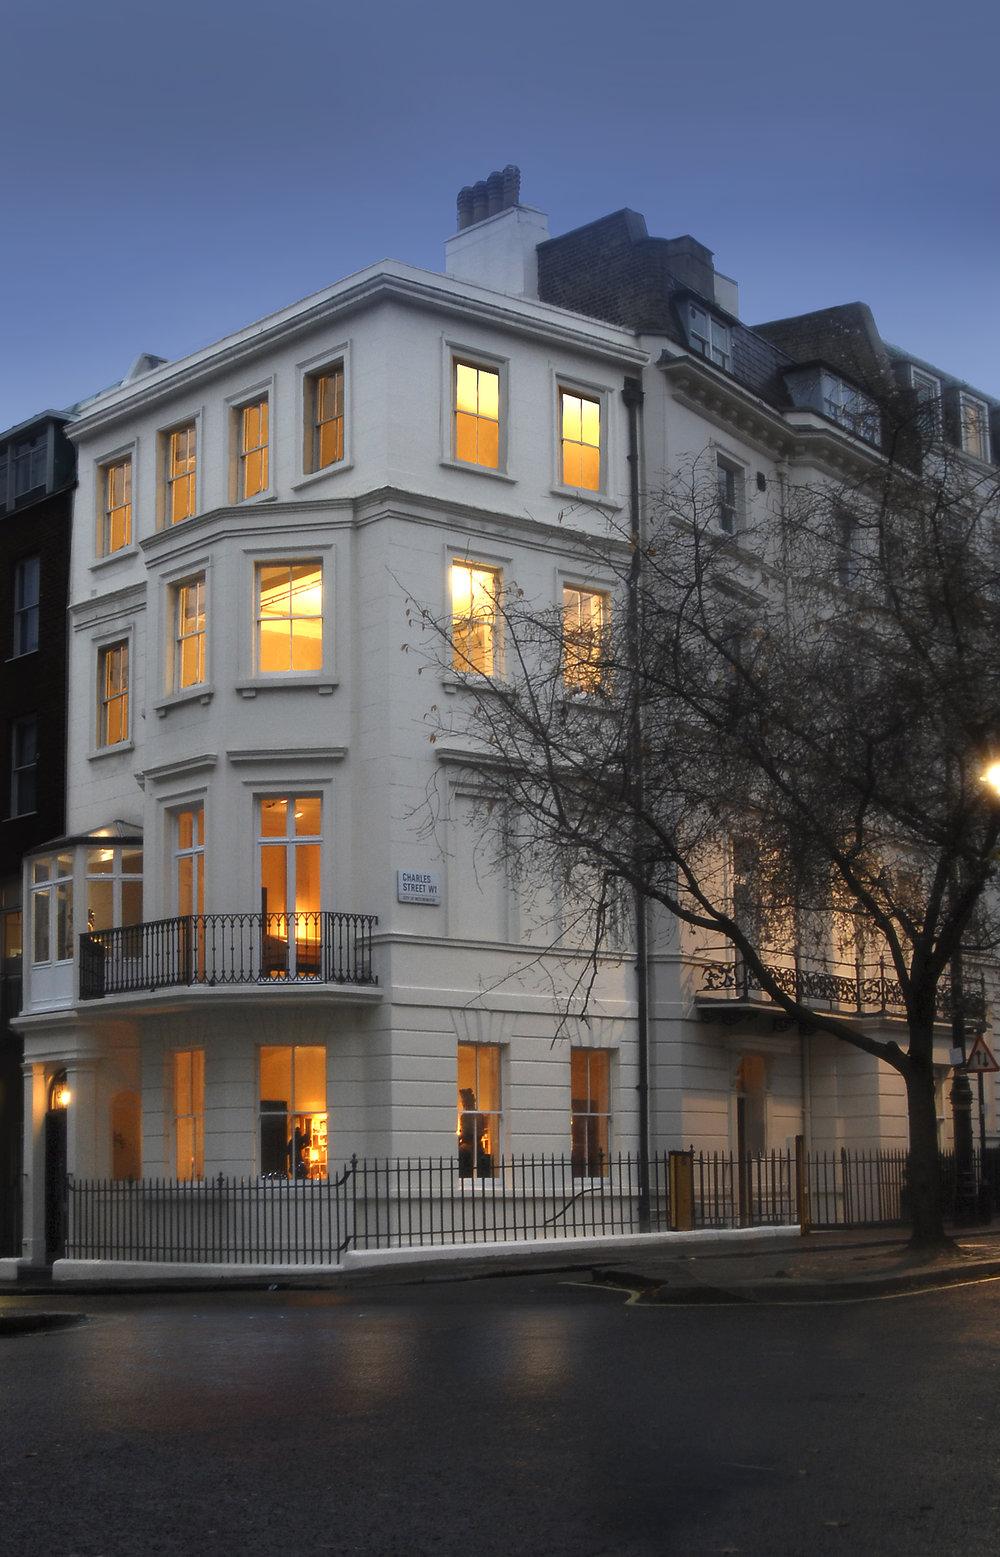 12 Queen Street, Mayfair, W1J 5PG